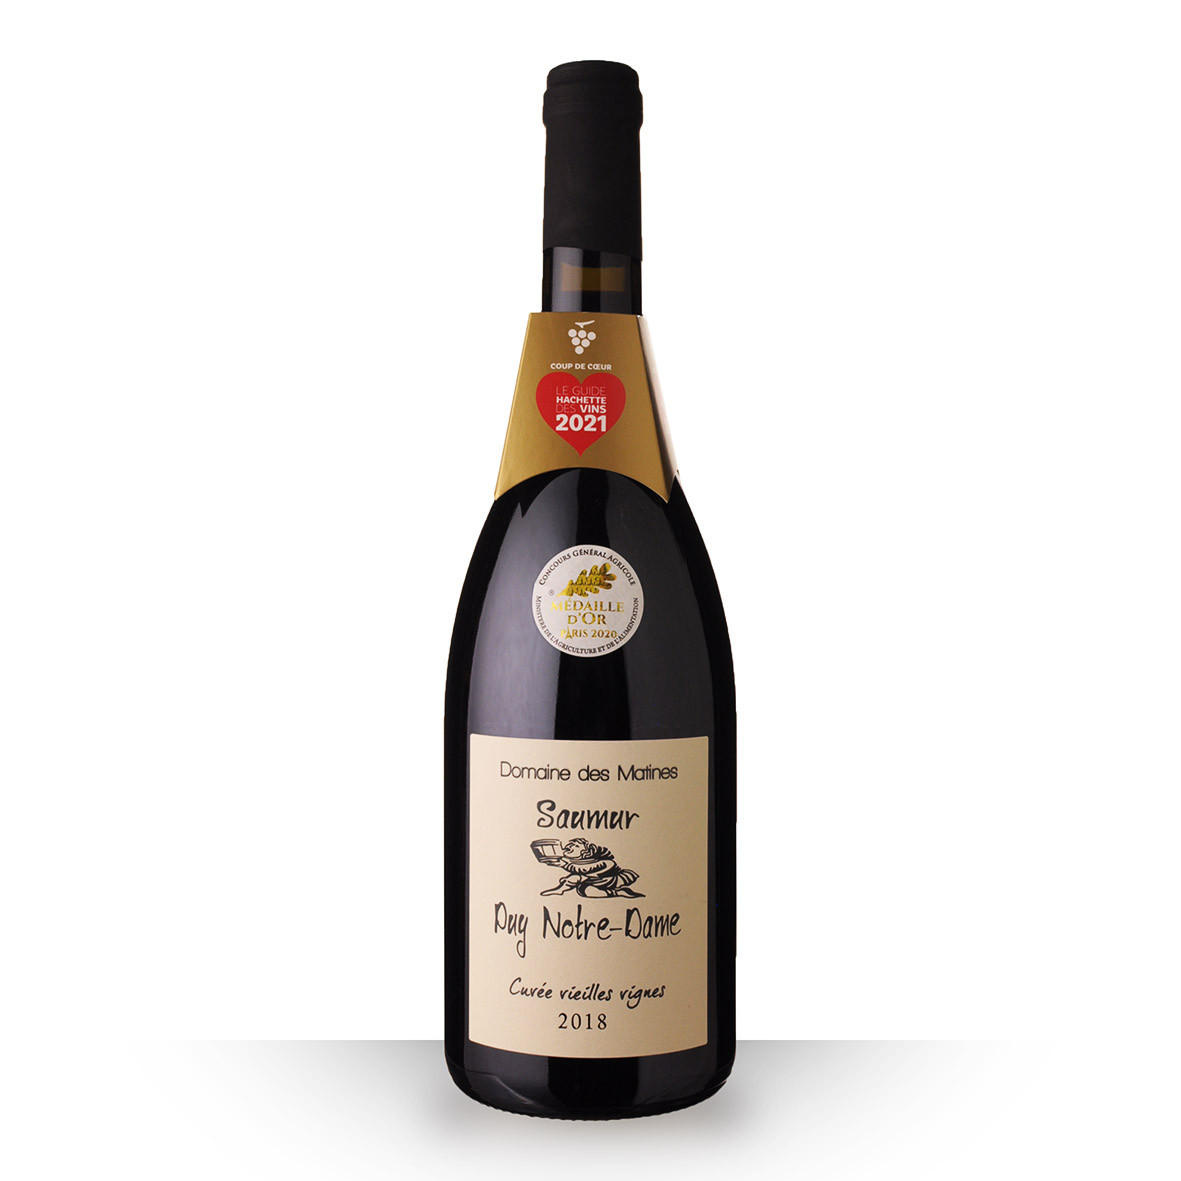 Domaine des Matines Saumur Puy Notre-Dame Rouge 2018 75cl www.odyssee-vins.com